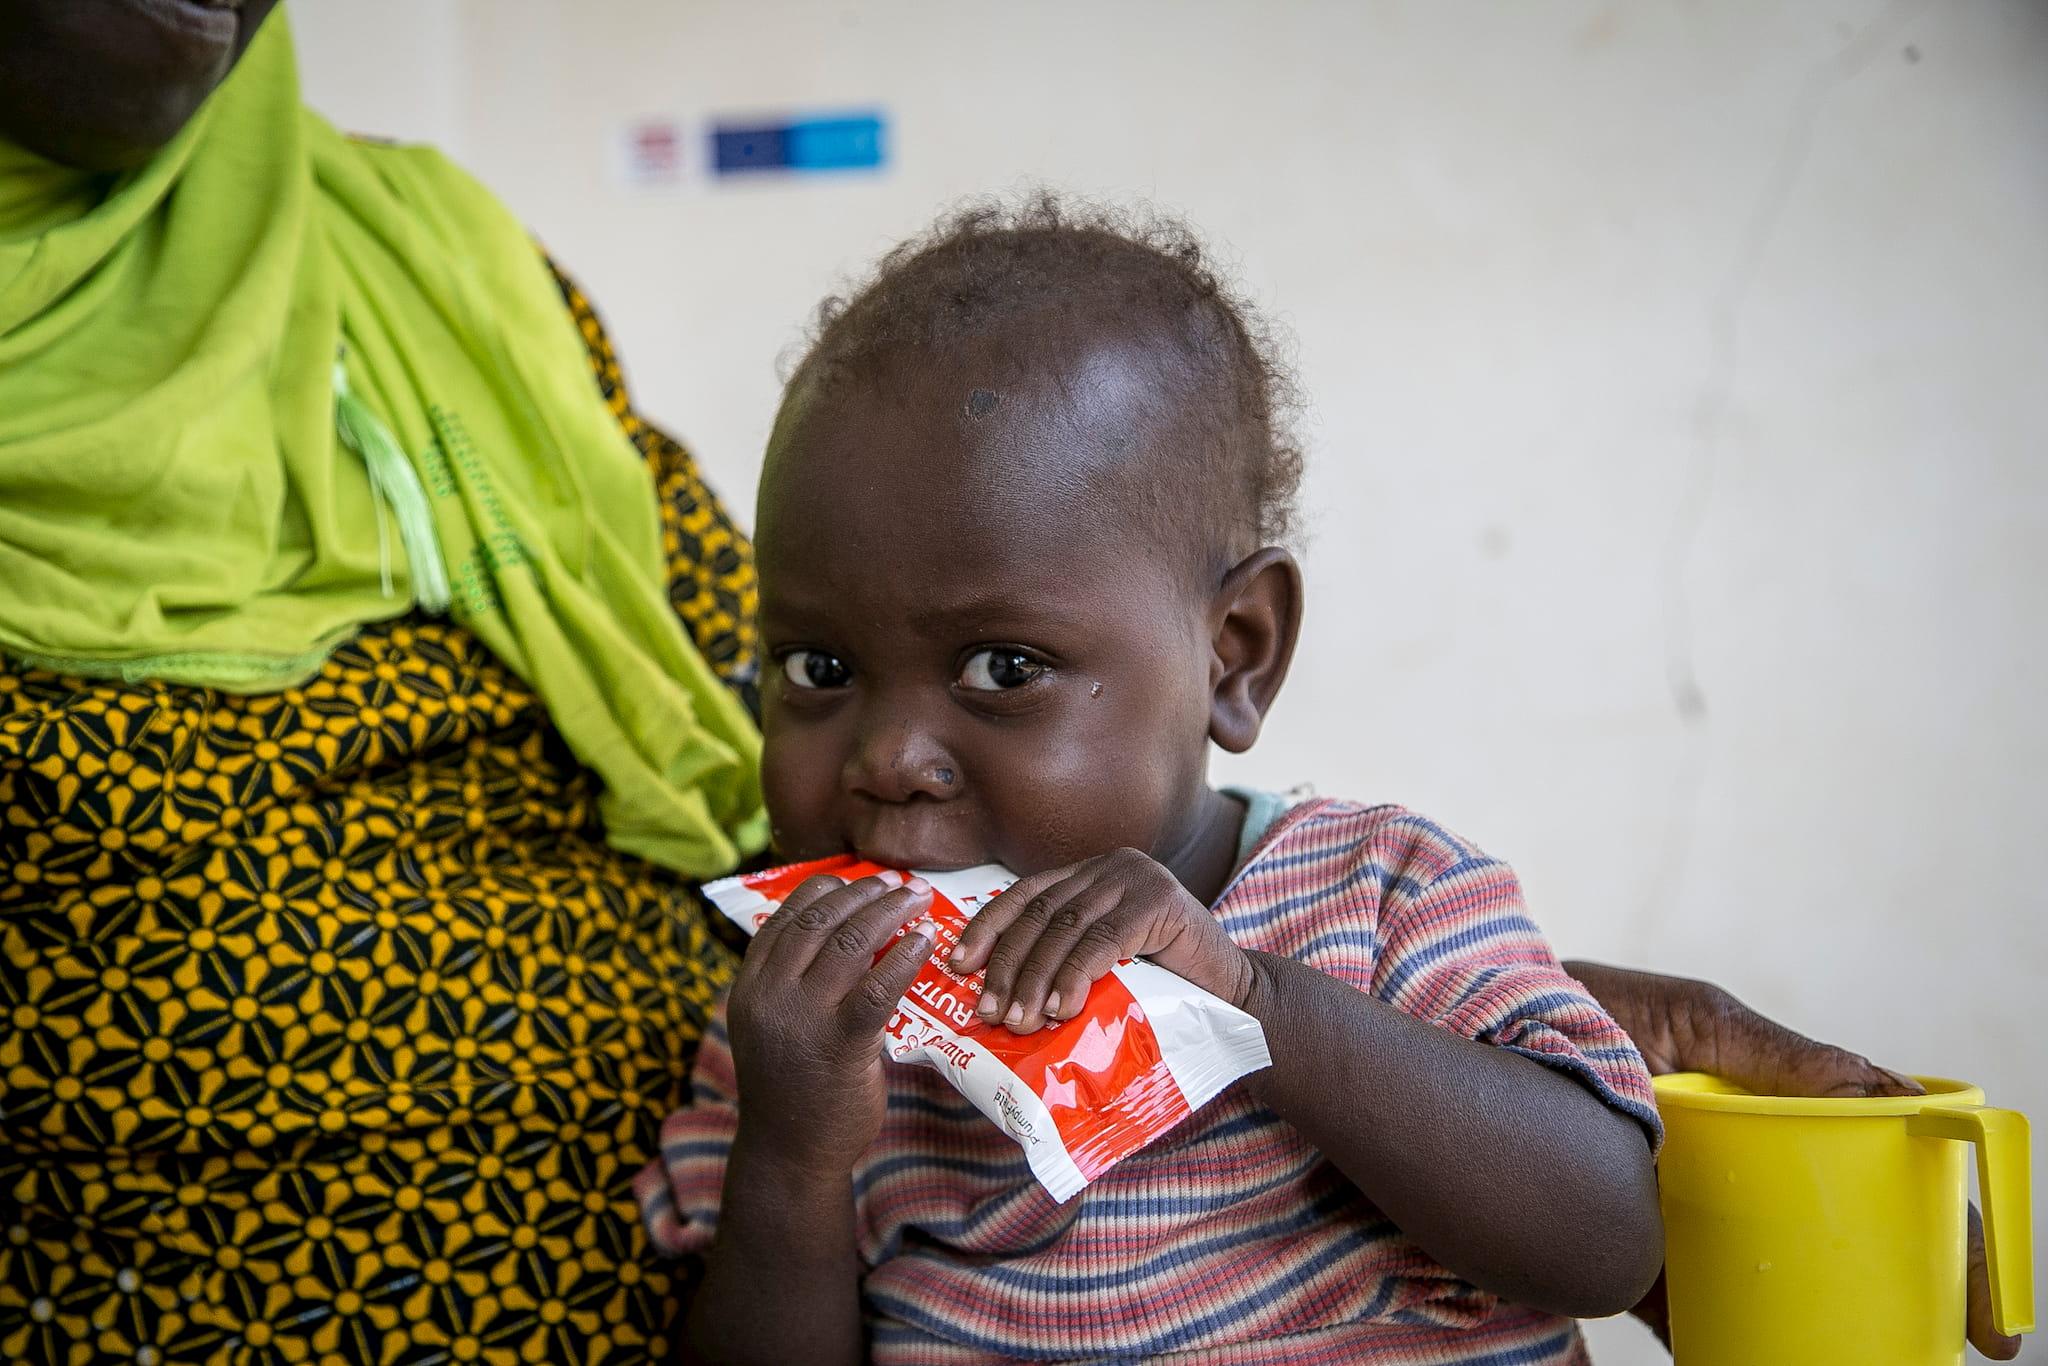 Oumou Bah, 2 - Mali - UN0248908